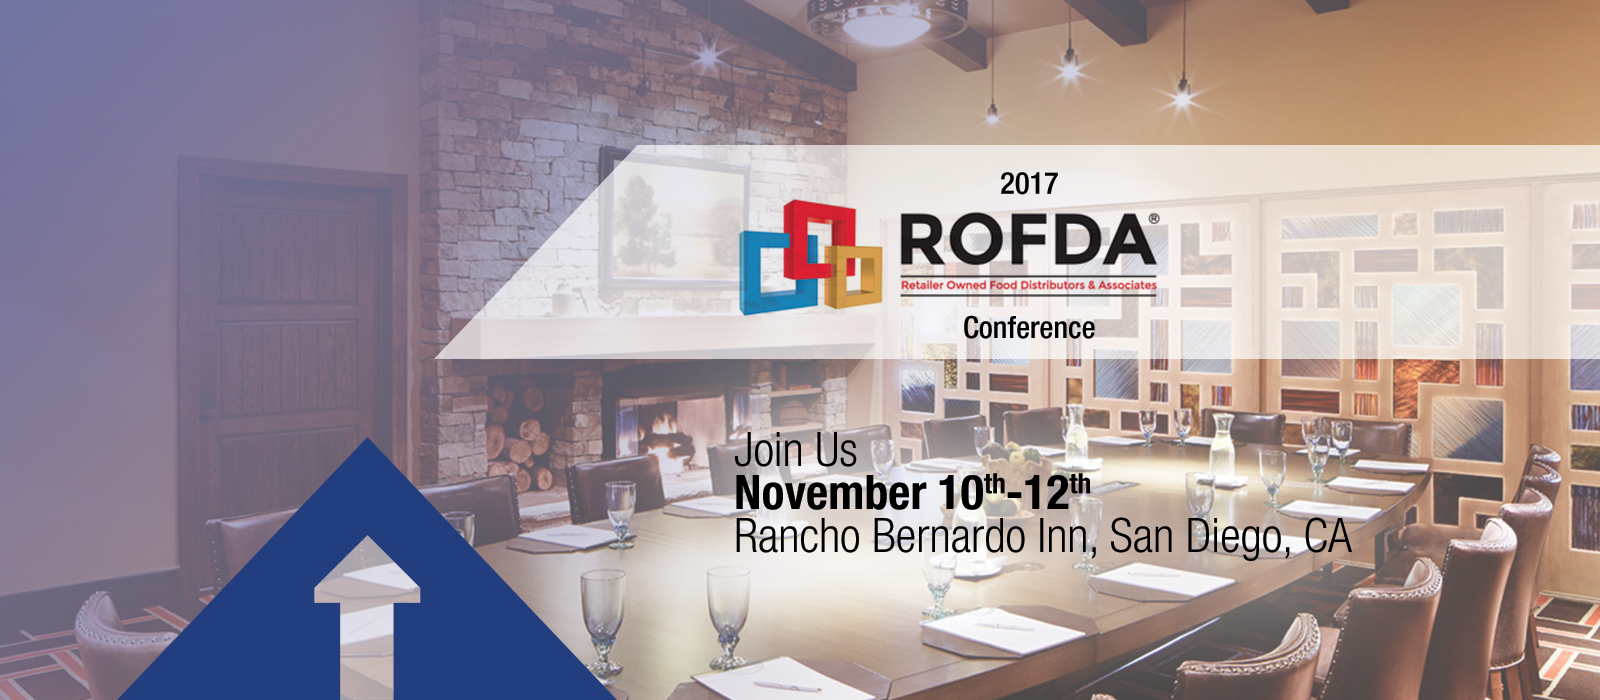 2017 ROFDA Conference